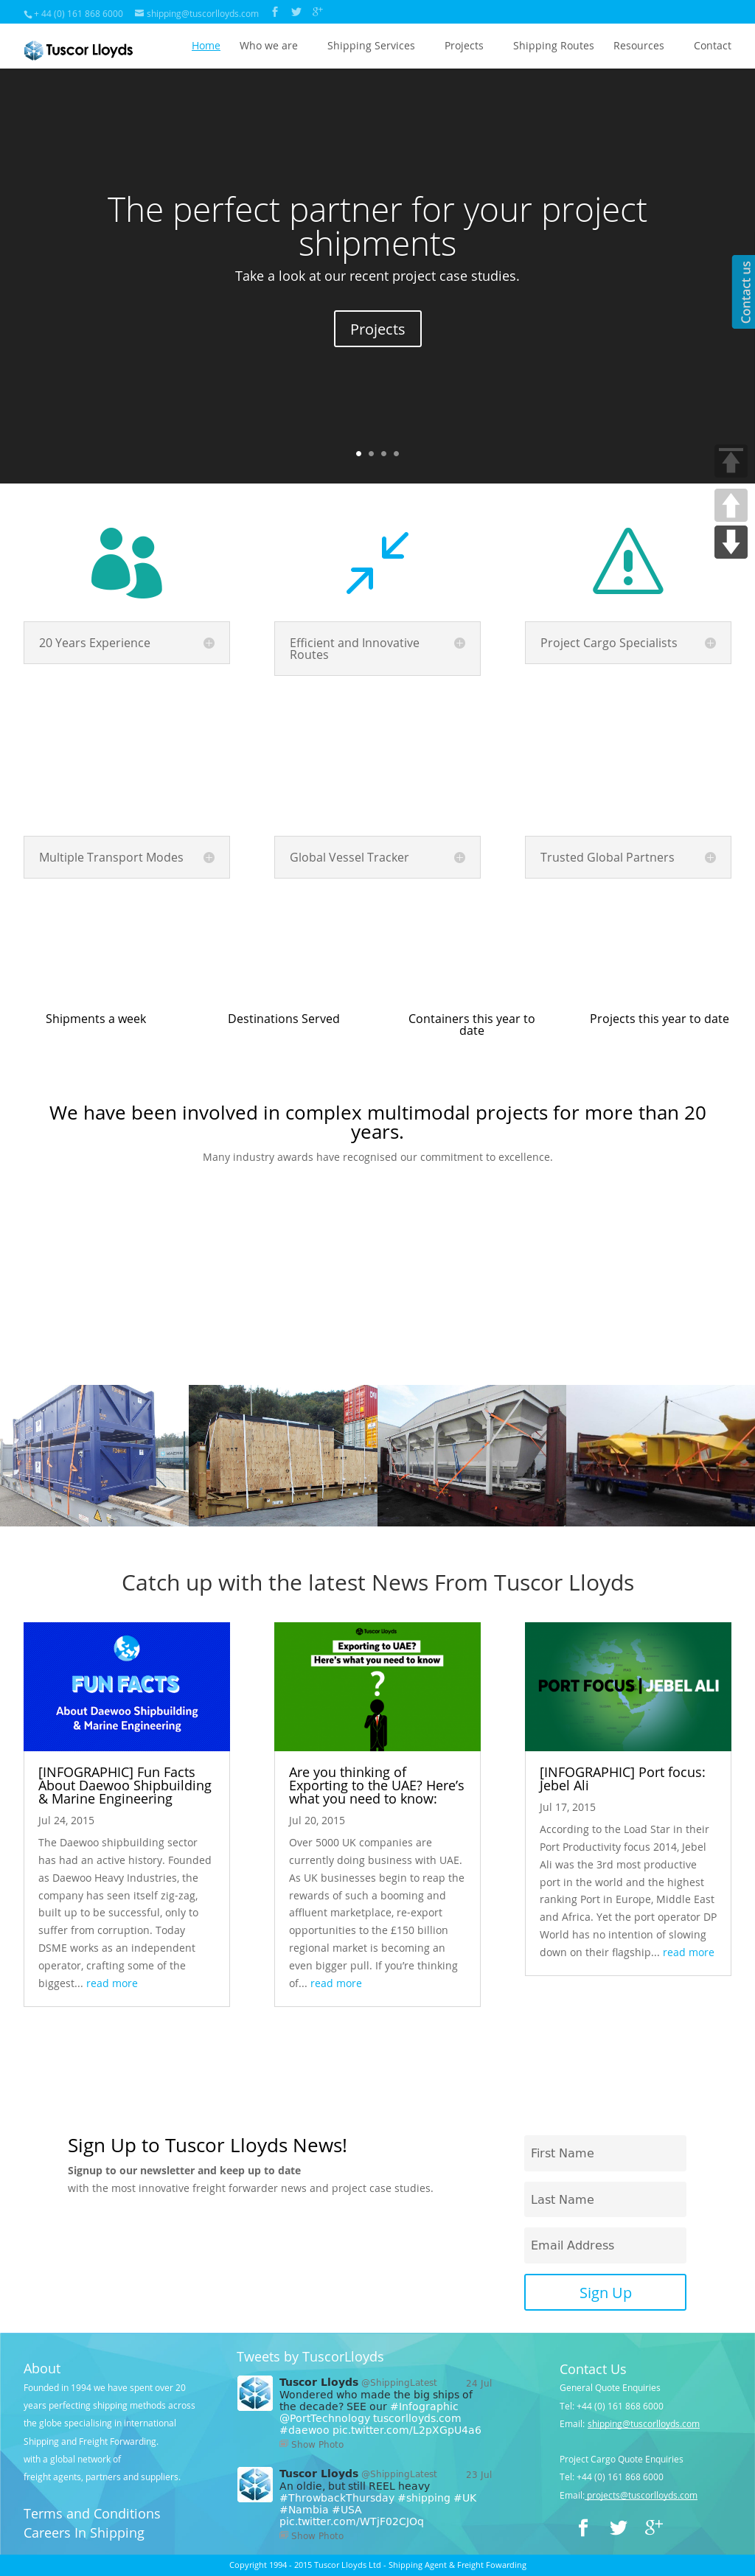 Tuscor Lloyds (Uk) Competitors, Revenue and Employees - Owler